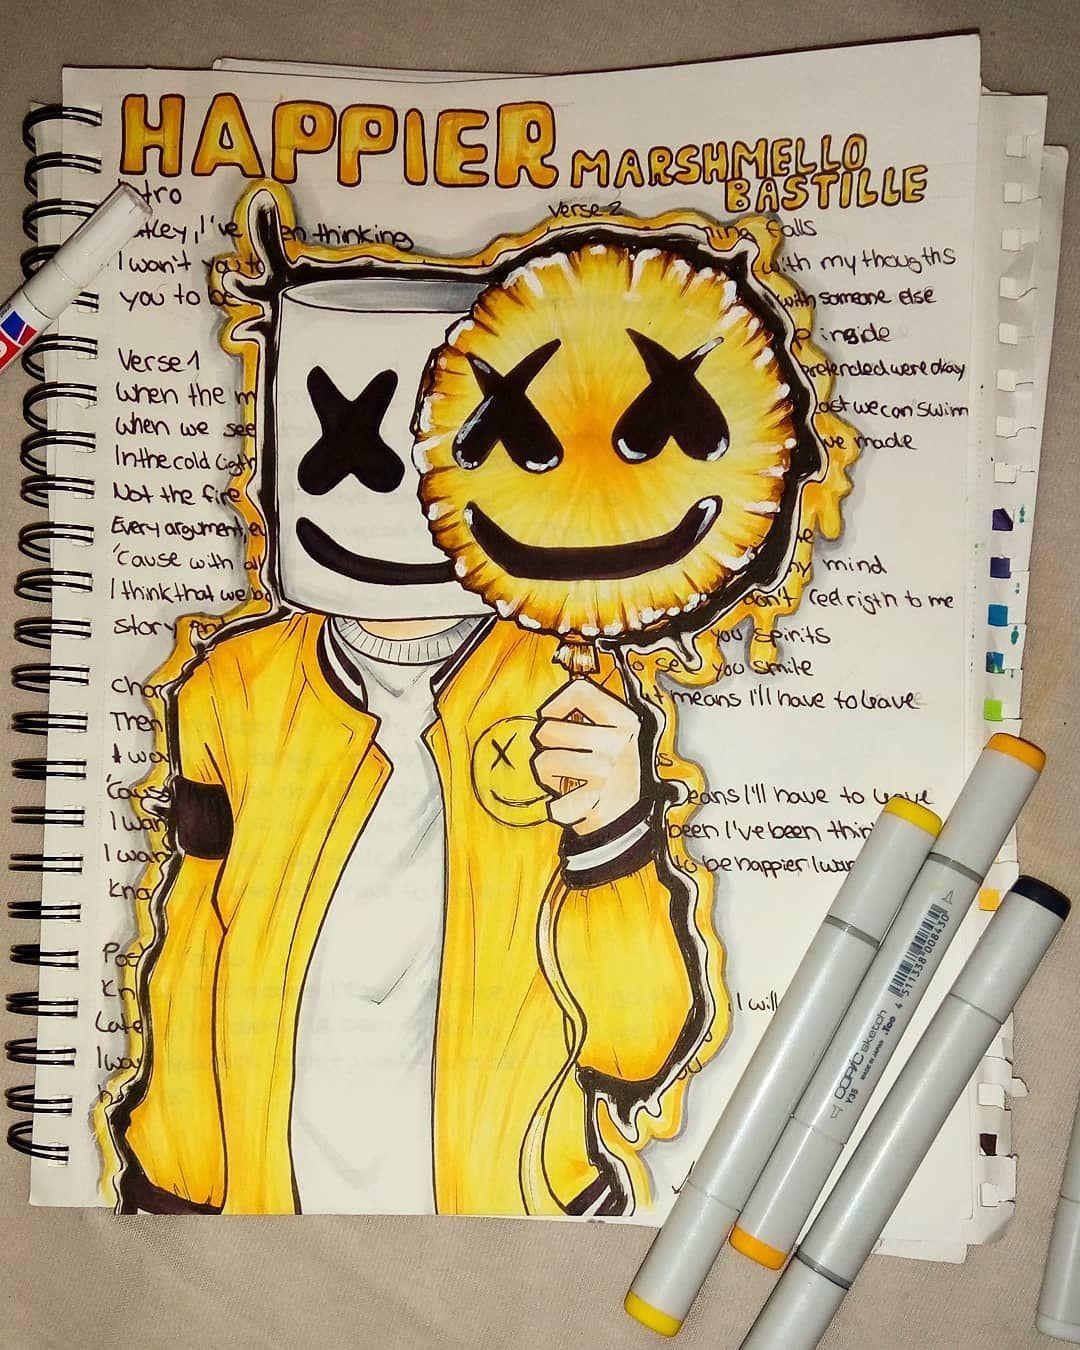 Lately I Ve Been Thinking I Want You To Be Happier Marshmello Mellogang Music Fana Doodle Art Drawing Dj Art Music Artwork